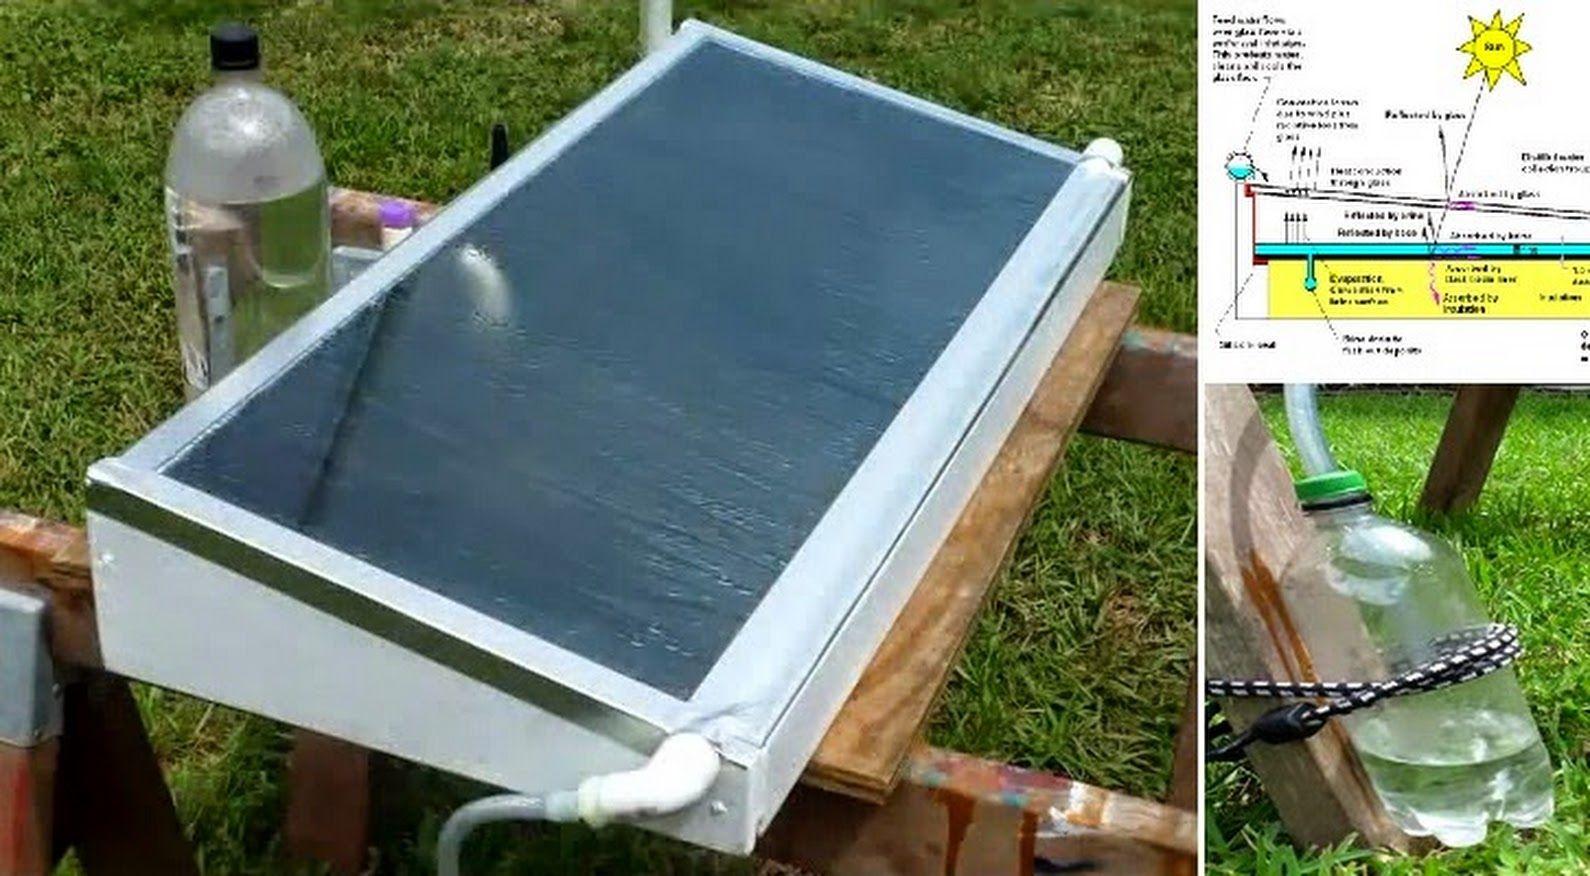 diy solar water distiller how to make httpwwwgoodshomedesign